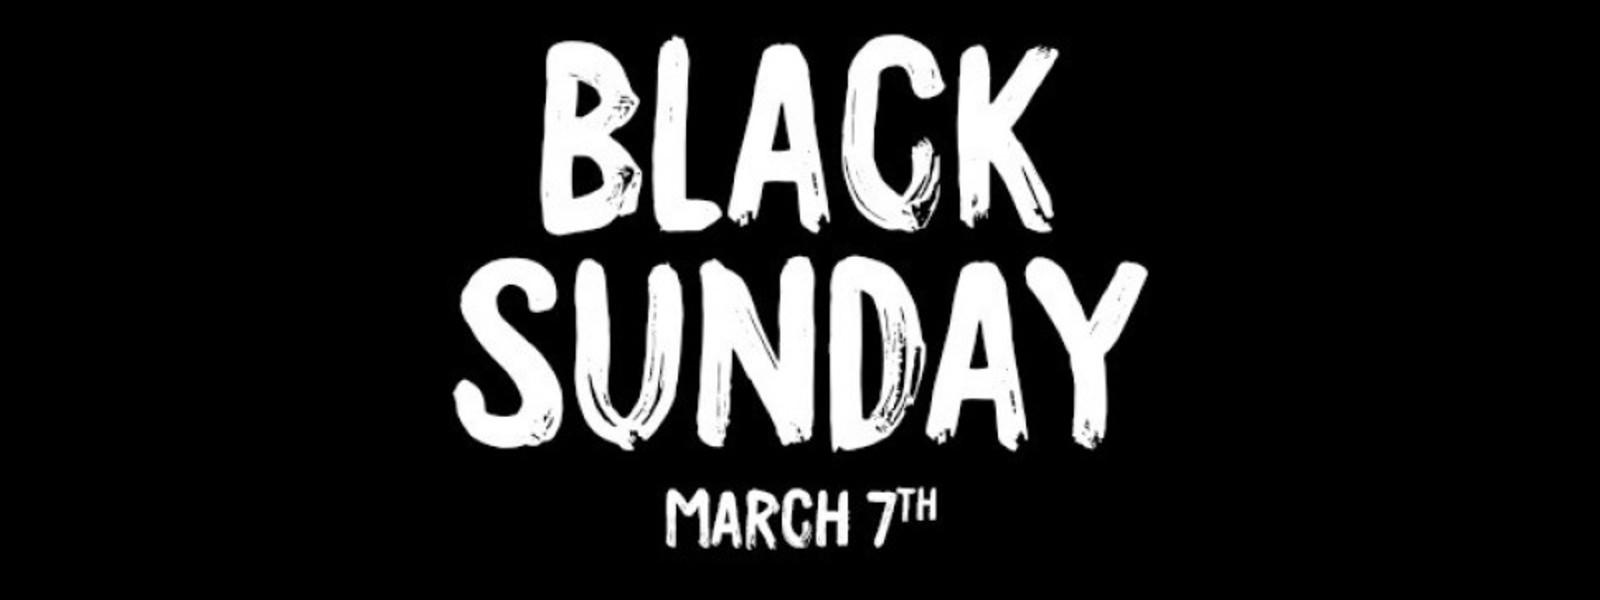 Sri Lankan Catholics mark 'Black Sunday', demanding justice for terror attack victims